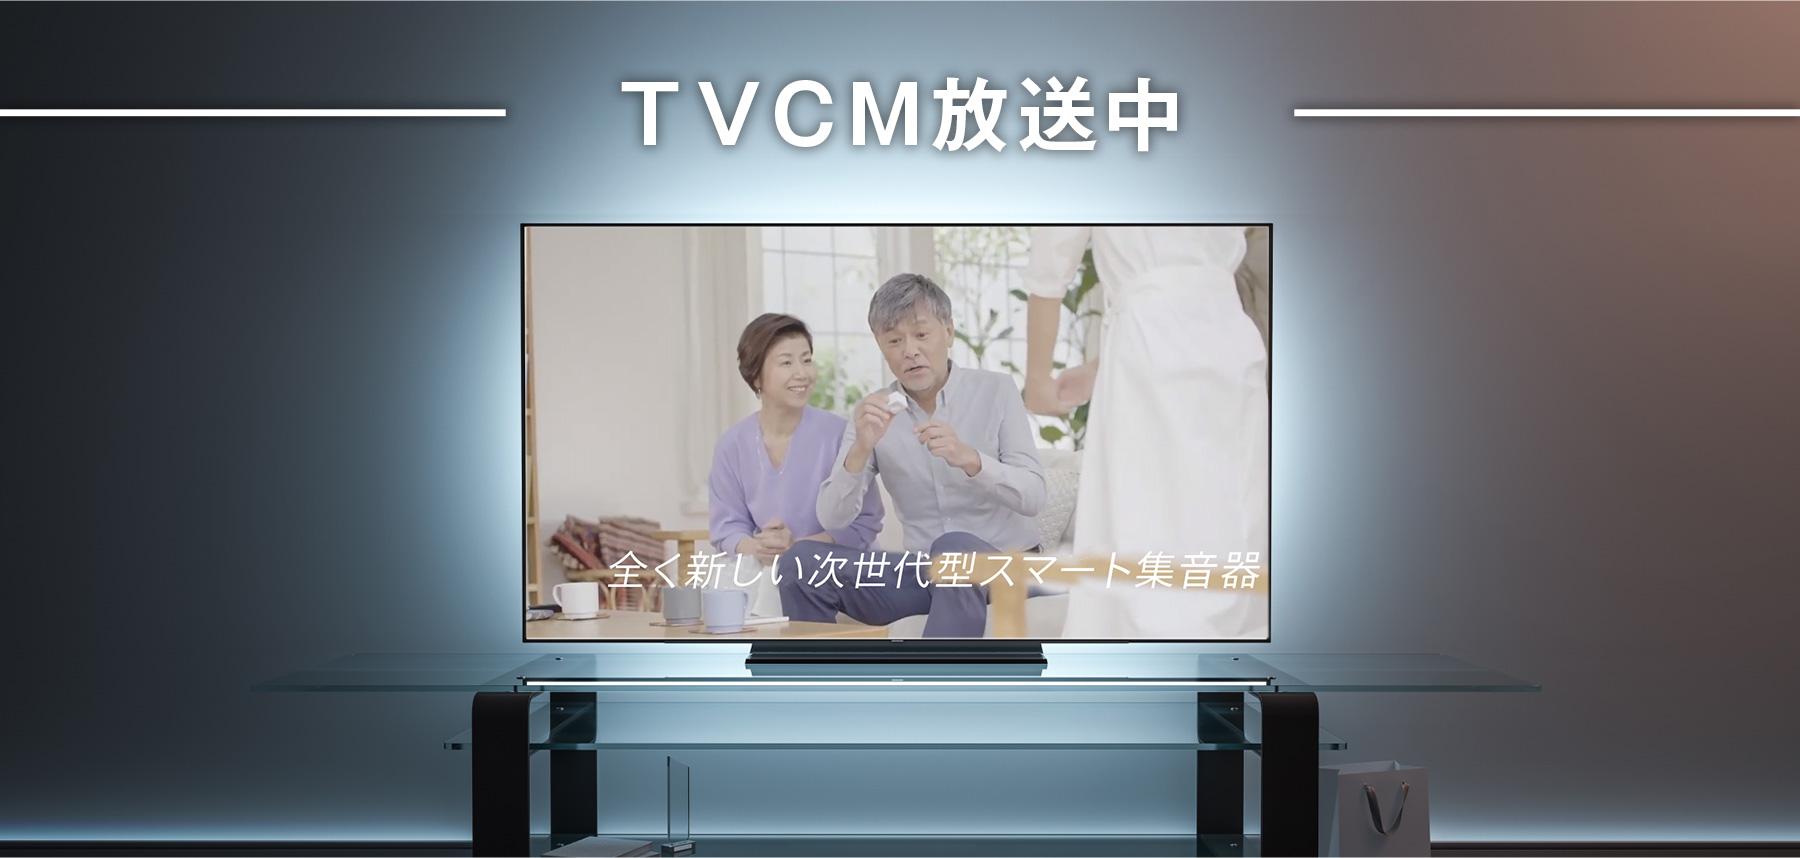 TV CM 放映中